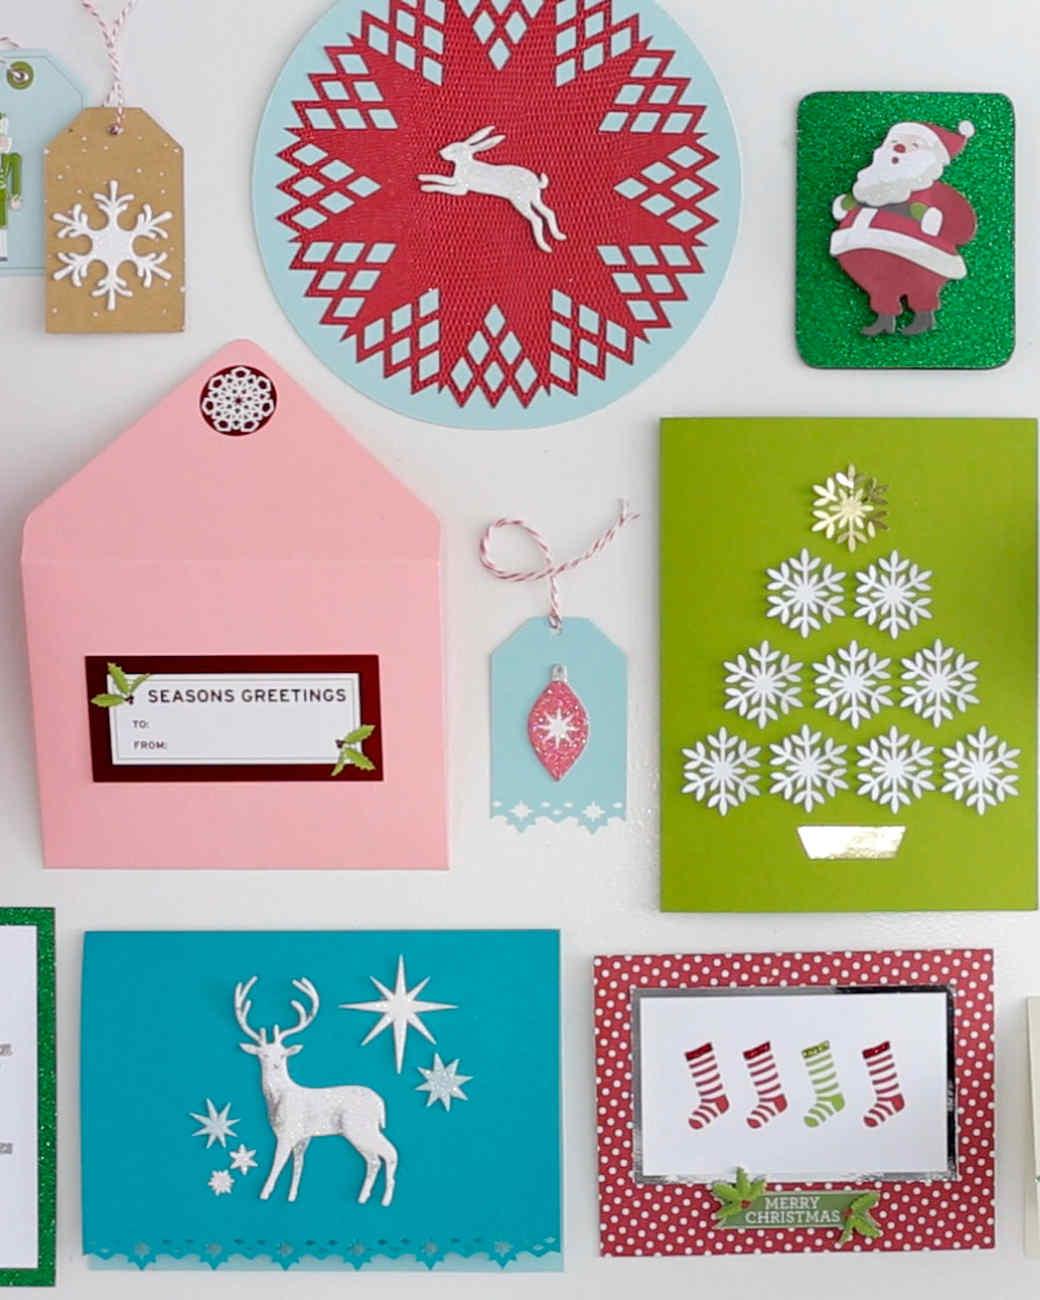 martha_stewart_crafts_holiday_card_making.jpg